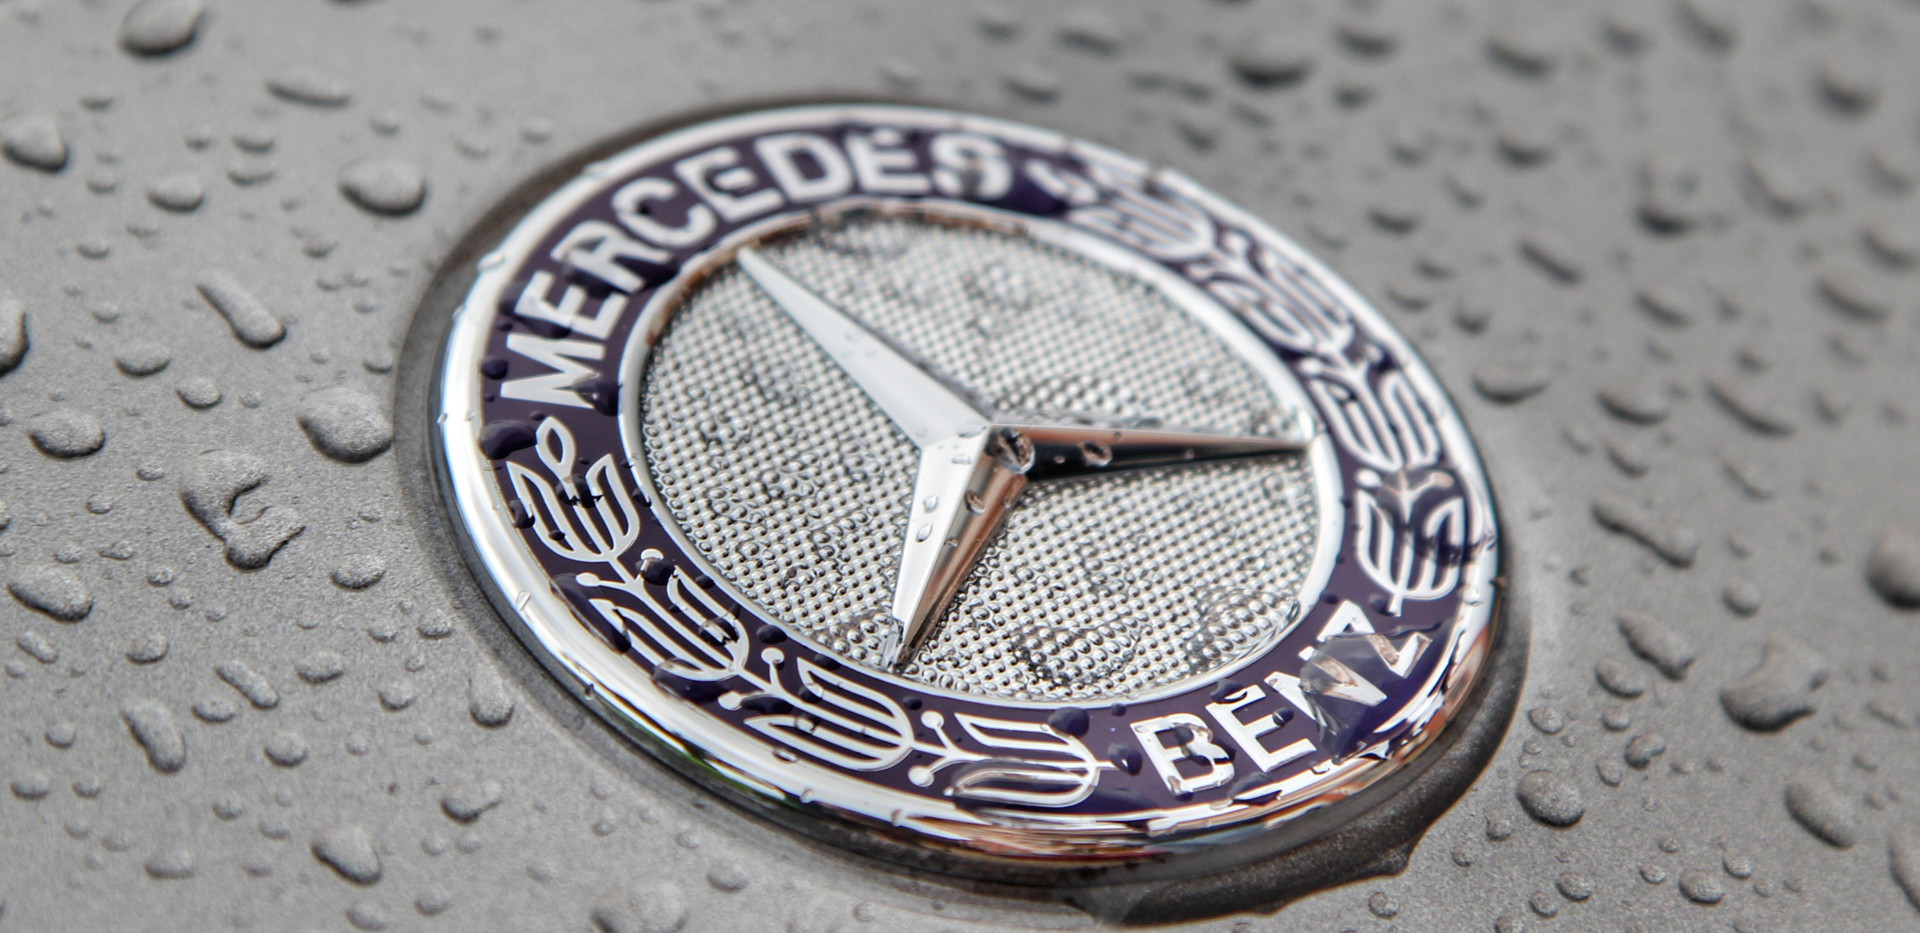 Mercedes Benz - Details